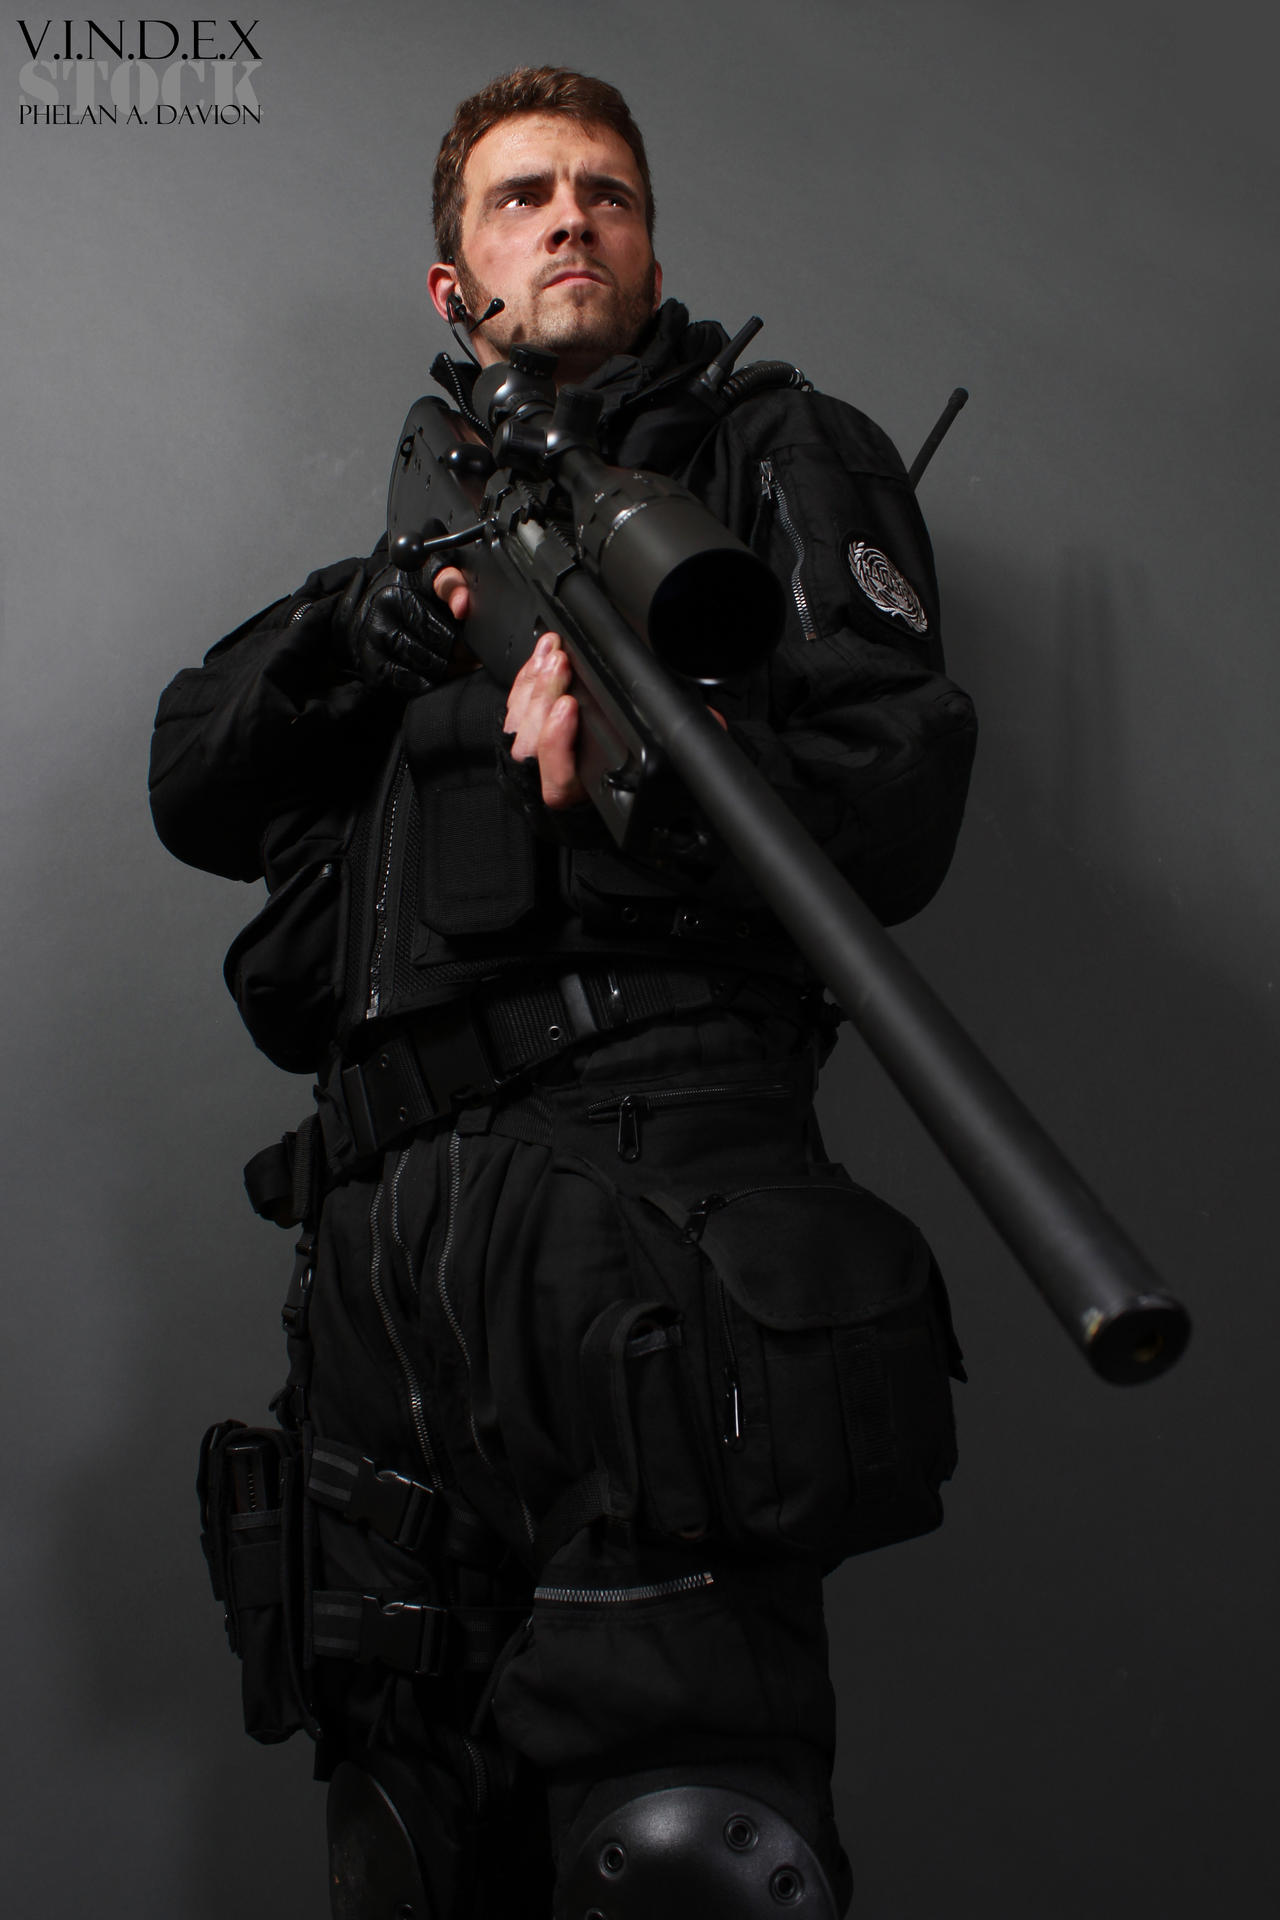 Sniper STOCK IX by PhelanDavion